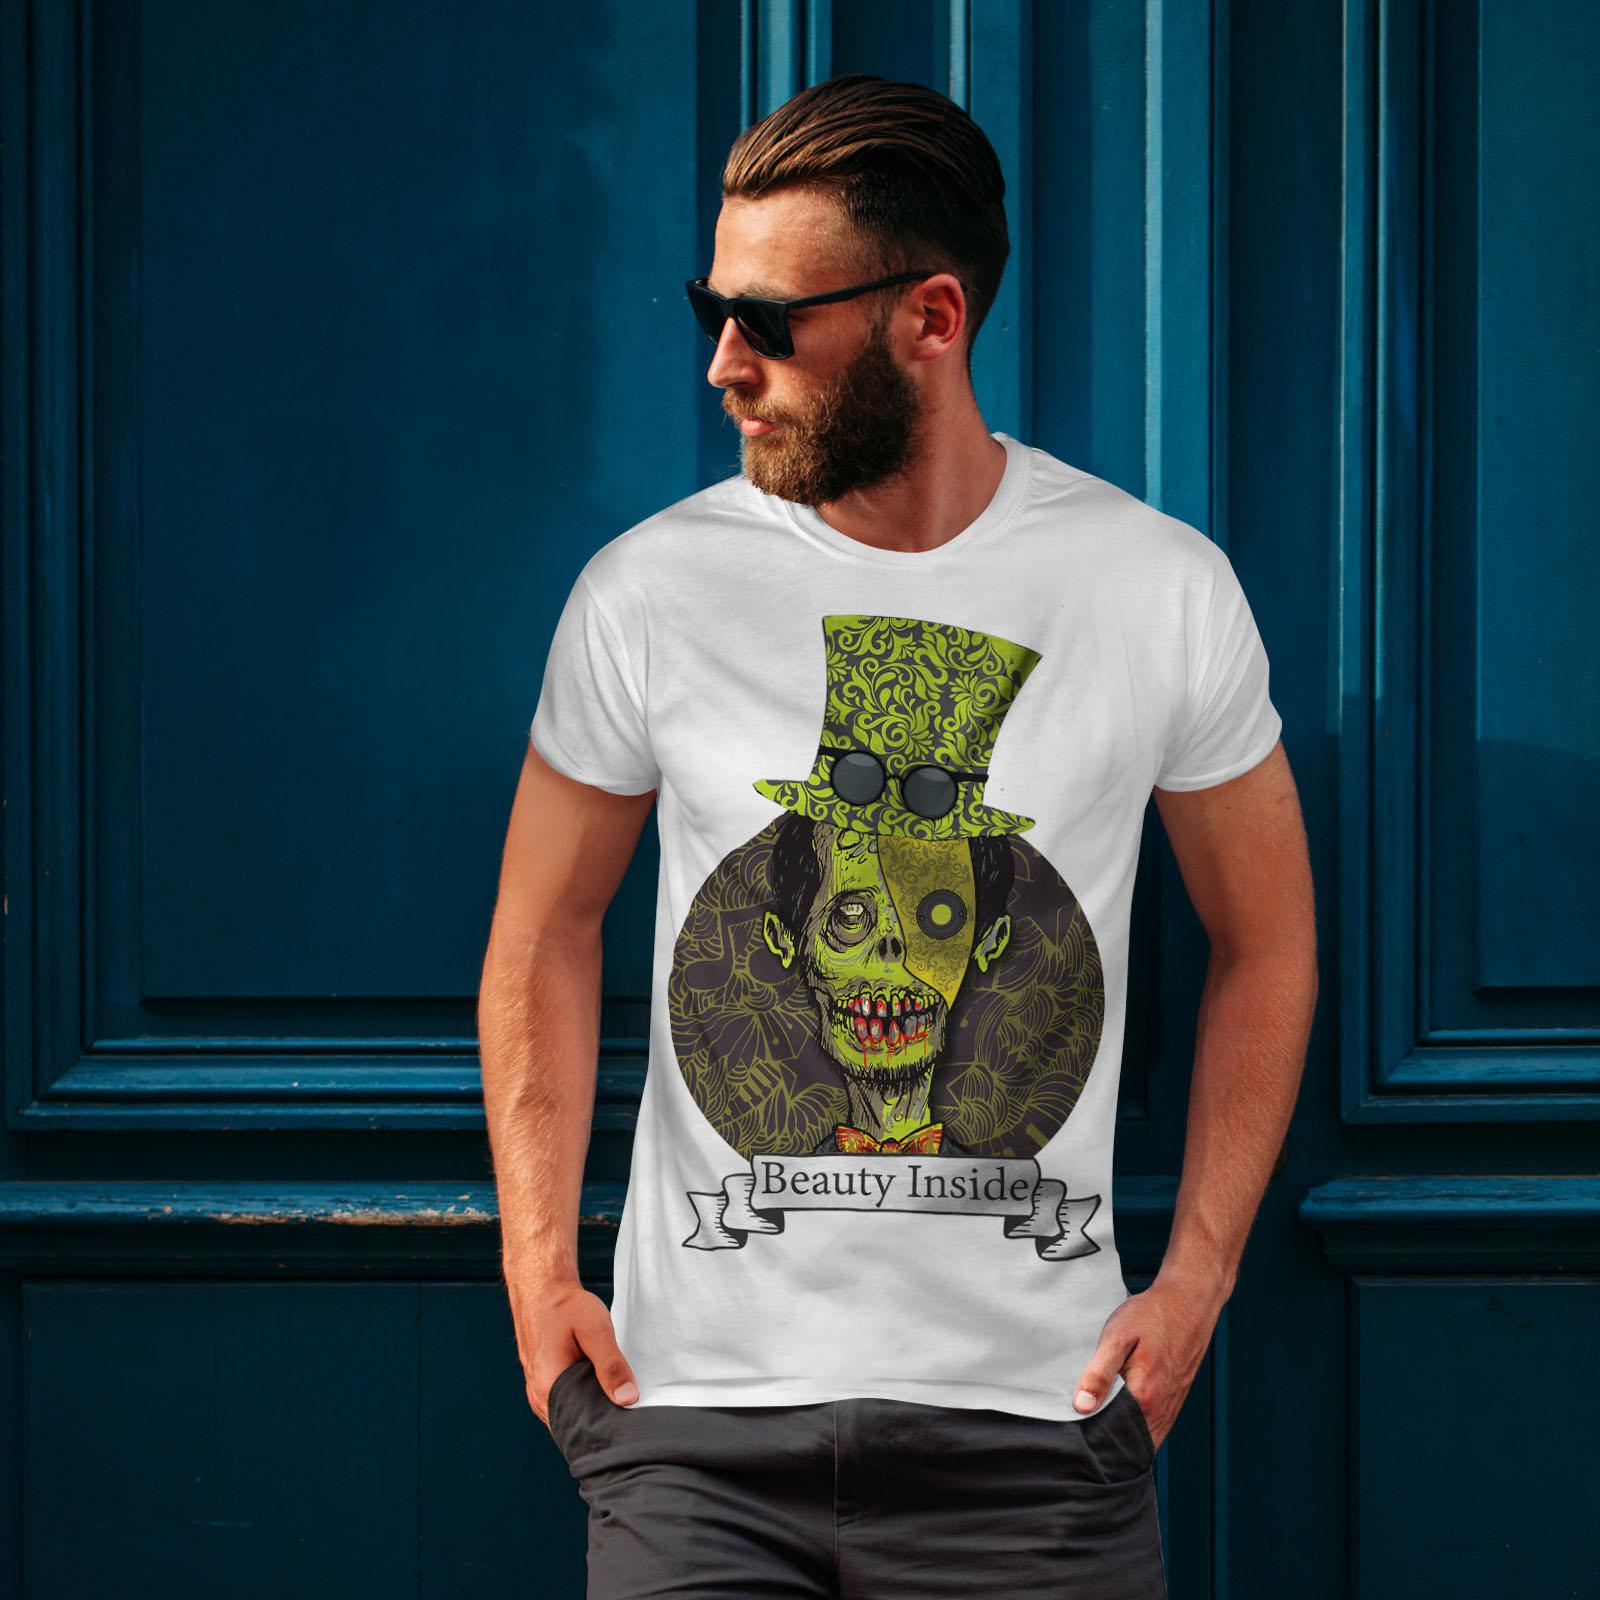 Wellcoda UOMO MORTO ZOMBIE Beauty da uomo T-shirt Spaventoso design grafico stampato T-shirt